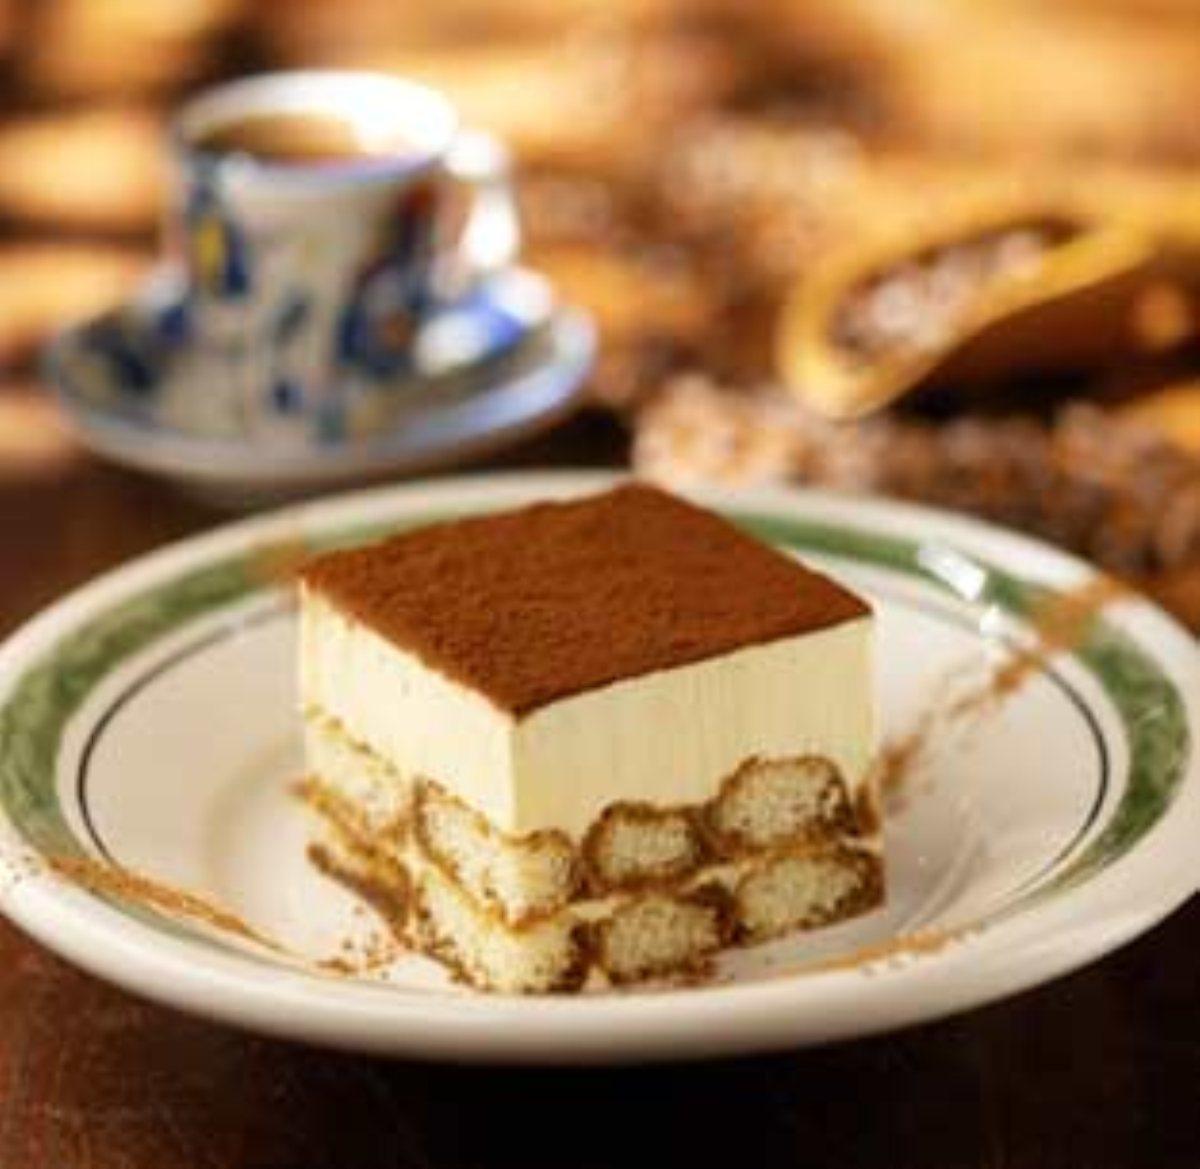 Recipes By Course Desserts Tiramisu Olive Garden Tiramisu Dessert